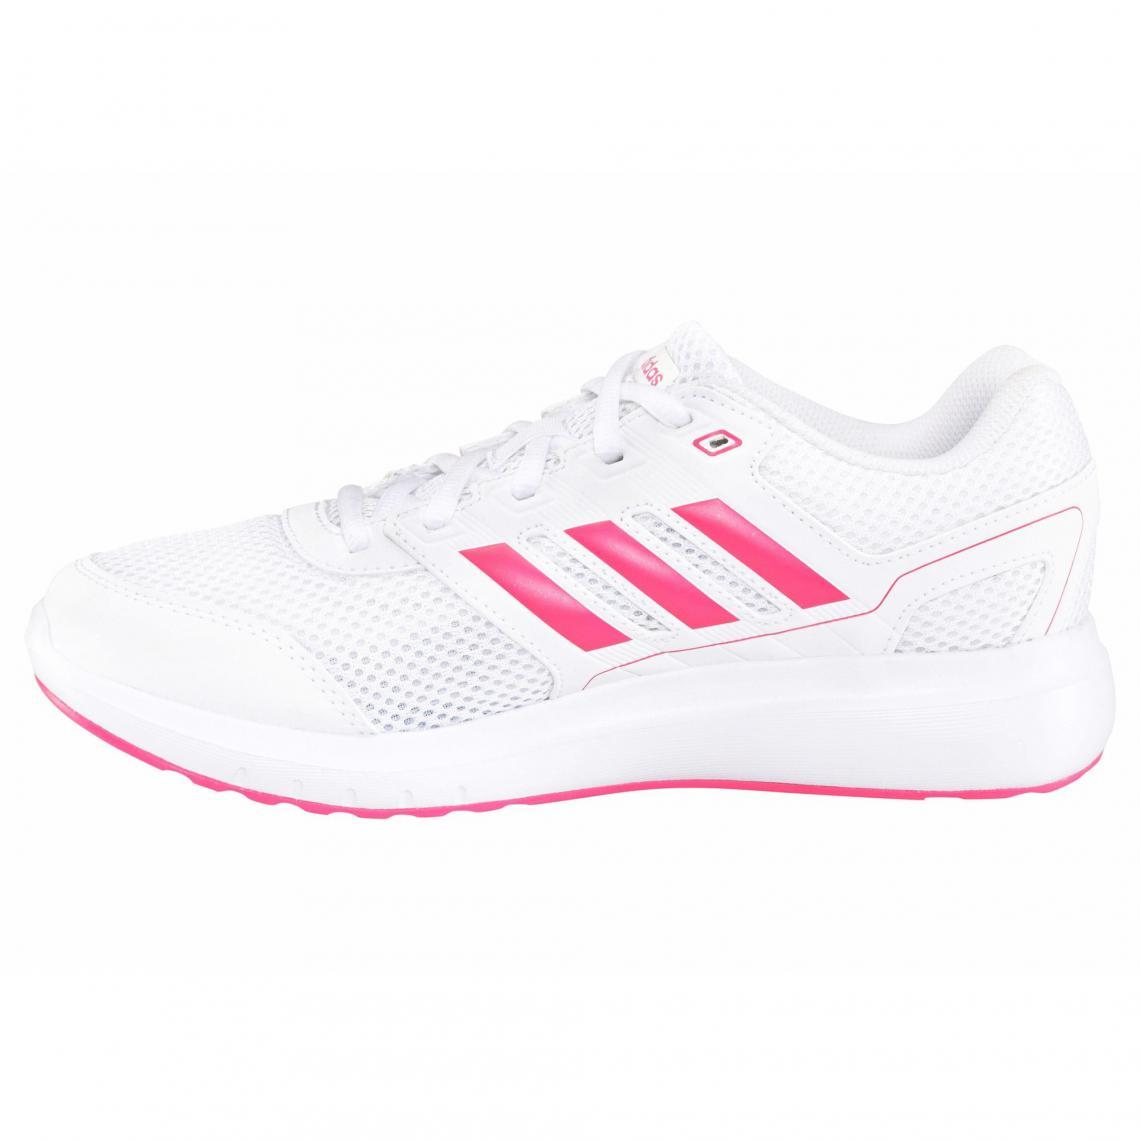 purchase cheap 0b2d4 cba48 Sneakers Adidas Cliquez limage pour lagrandir. adidas Performance Duramo  Lite 2.0 chaussures de running femme - Blanc ...